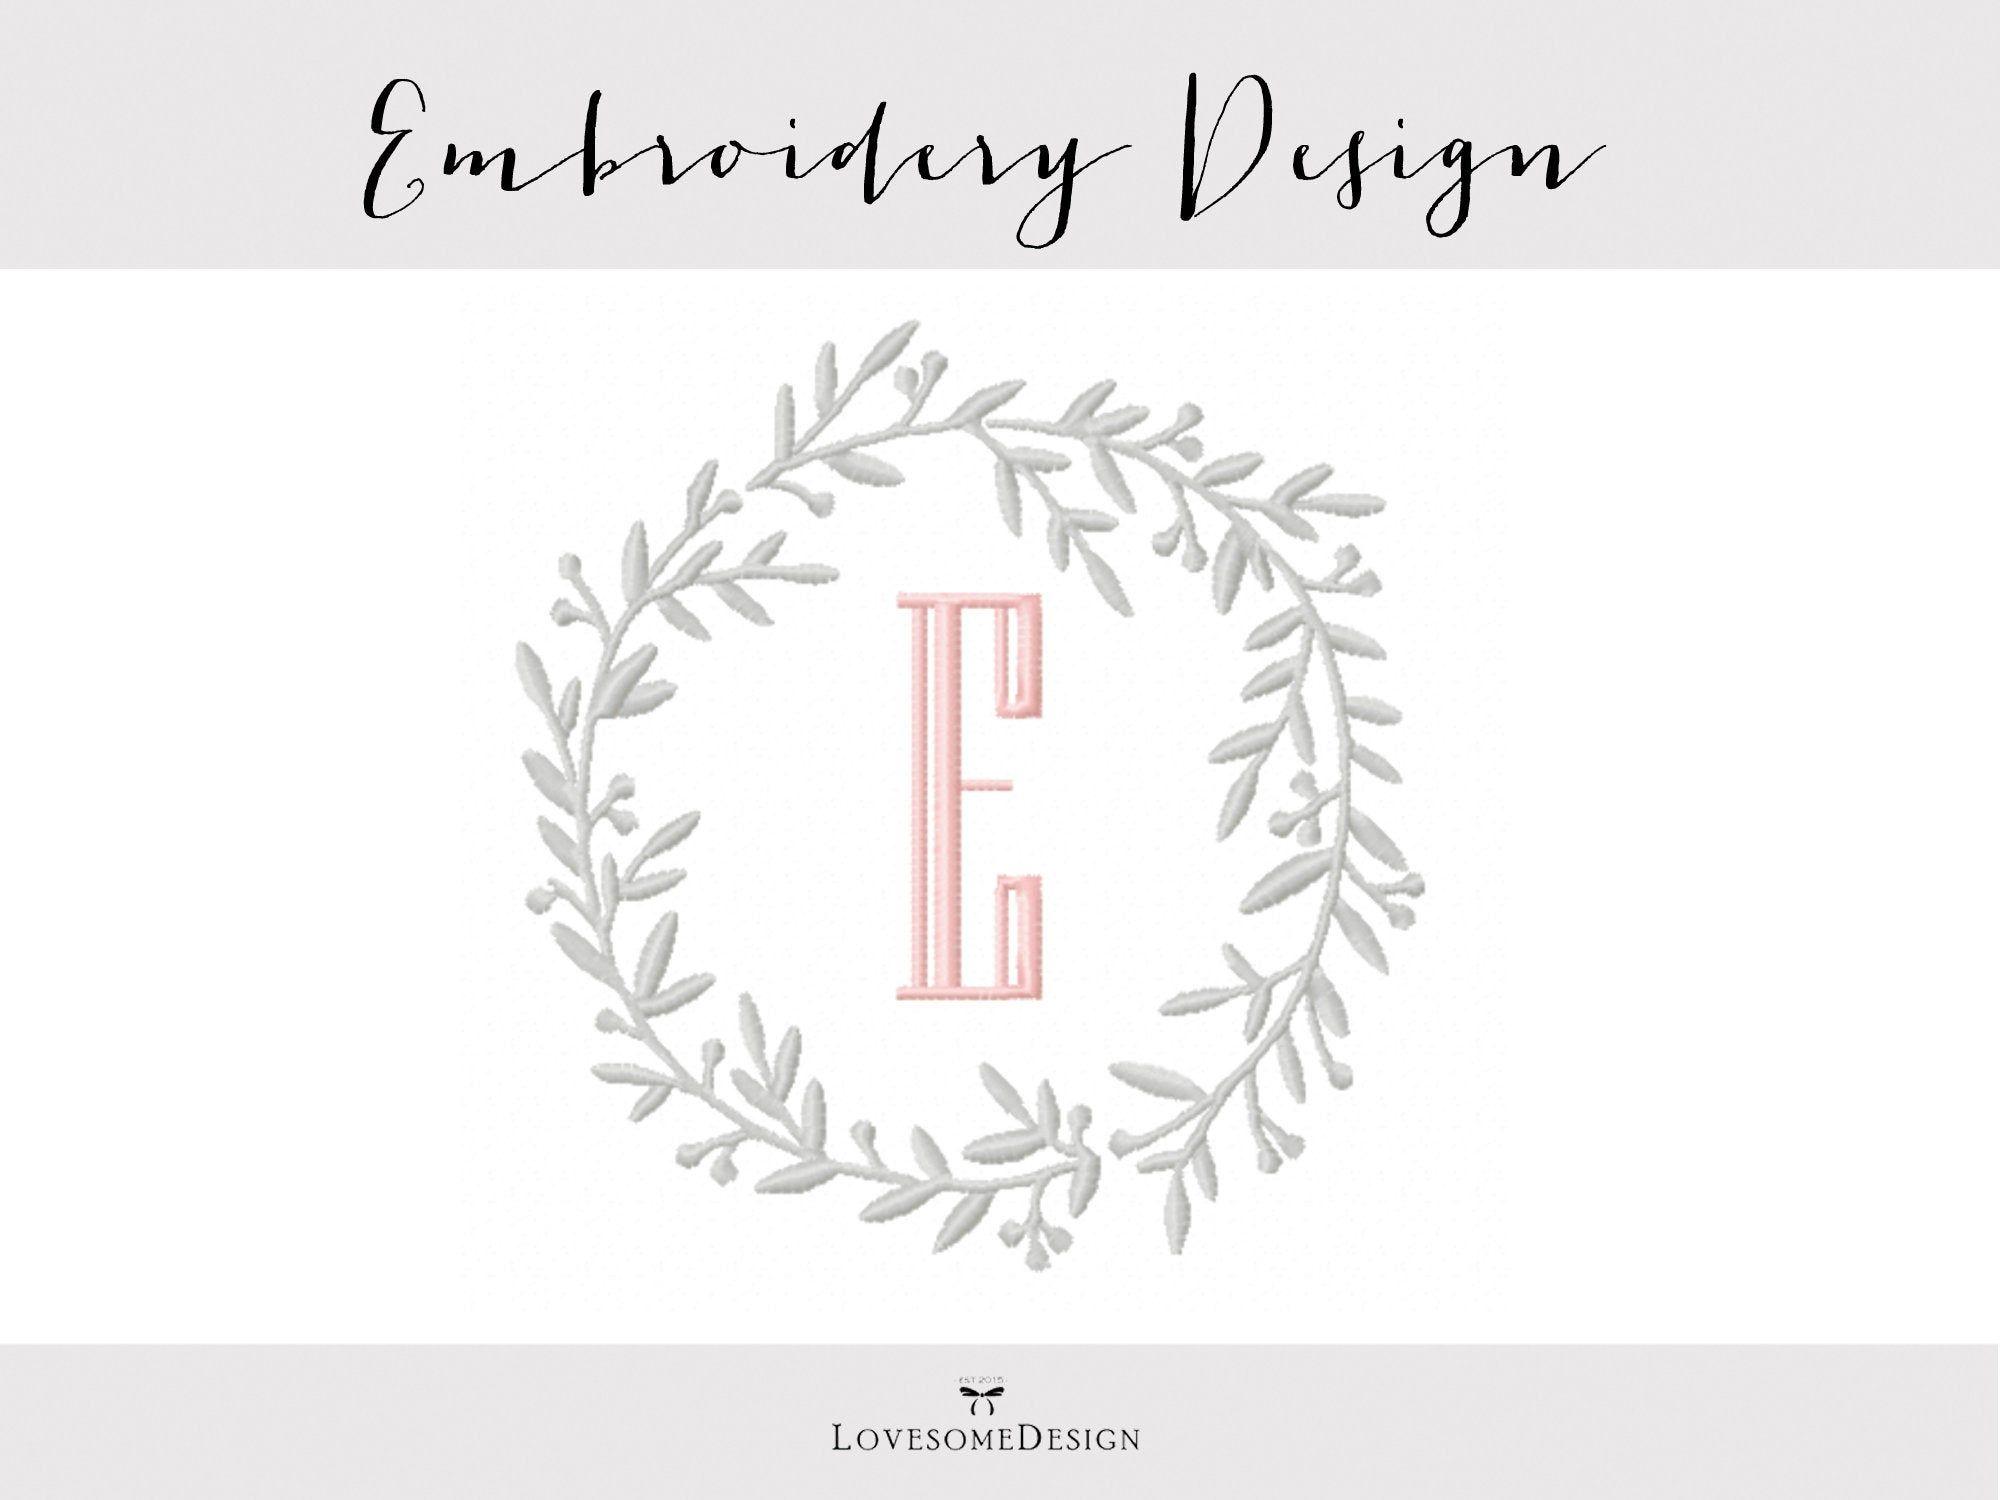 Photo of Vine Wreath Embroidery Design Four Sizes, Modern Embroidery Design, Wreath Embroidery, Laurel Embroidery Design, Wreath for Monograms